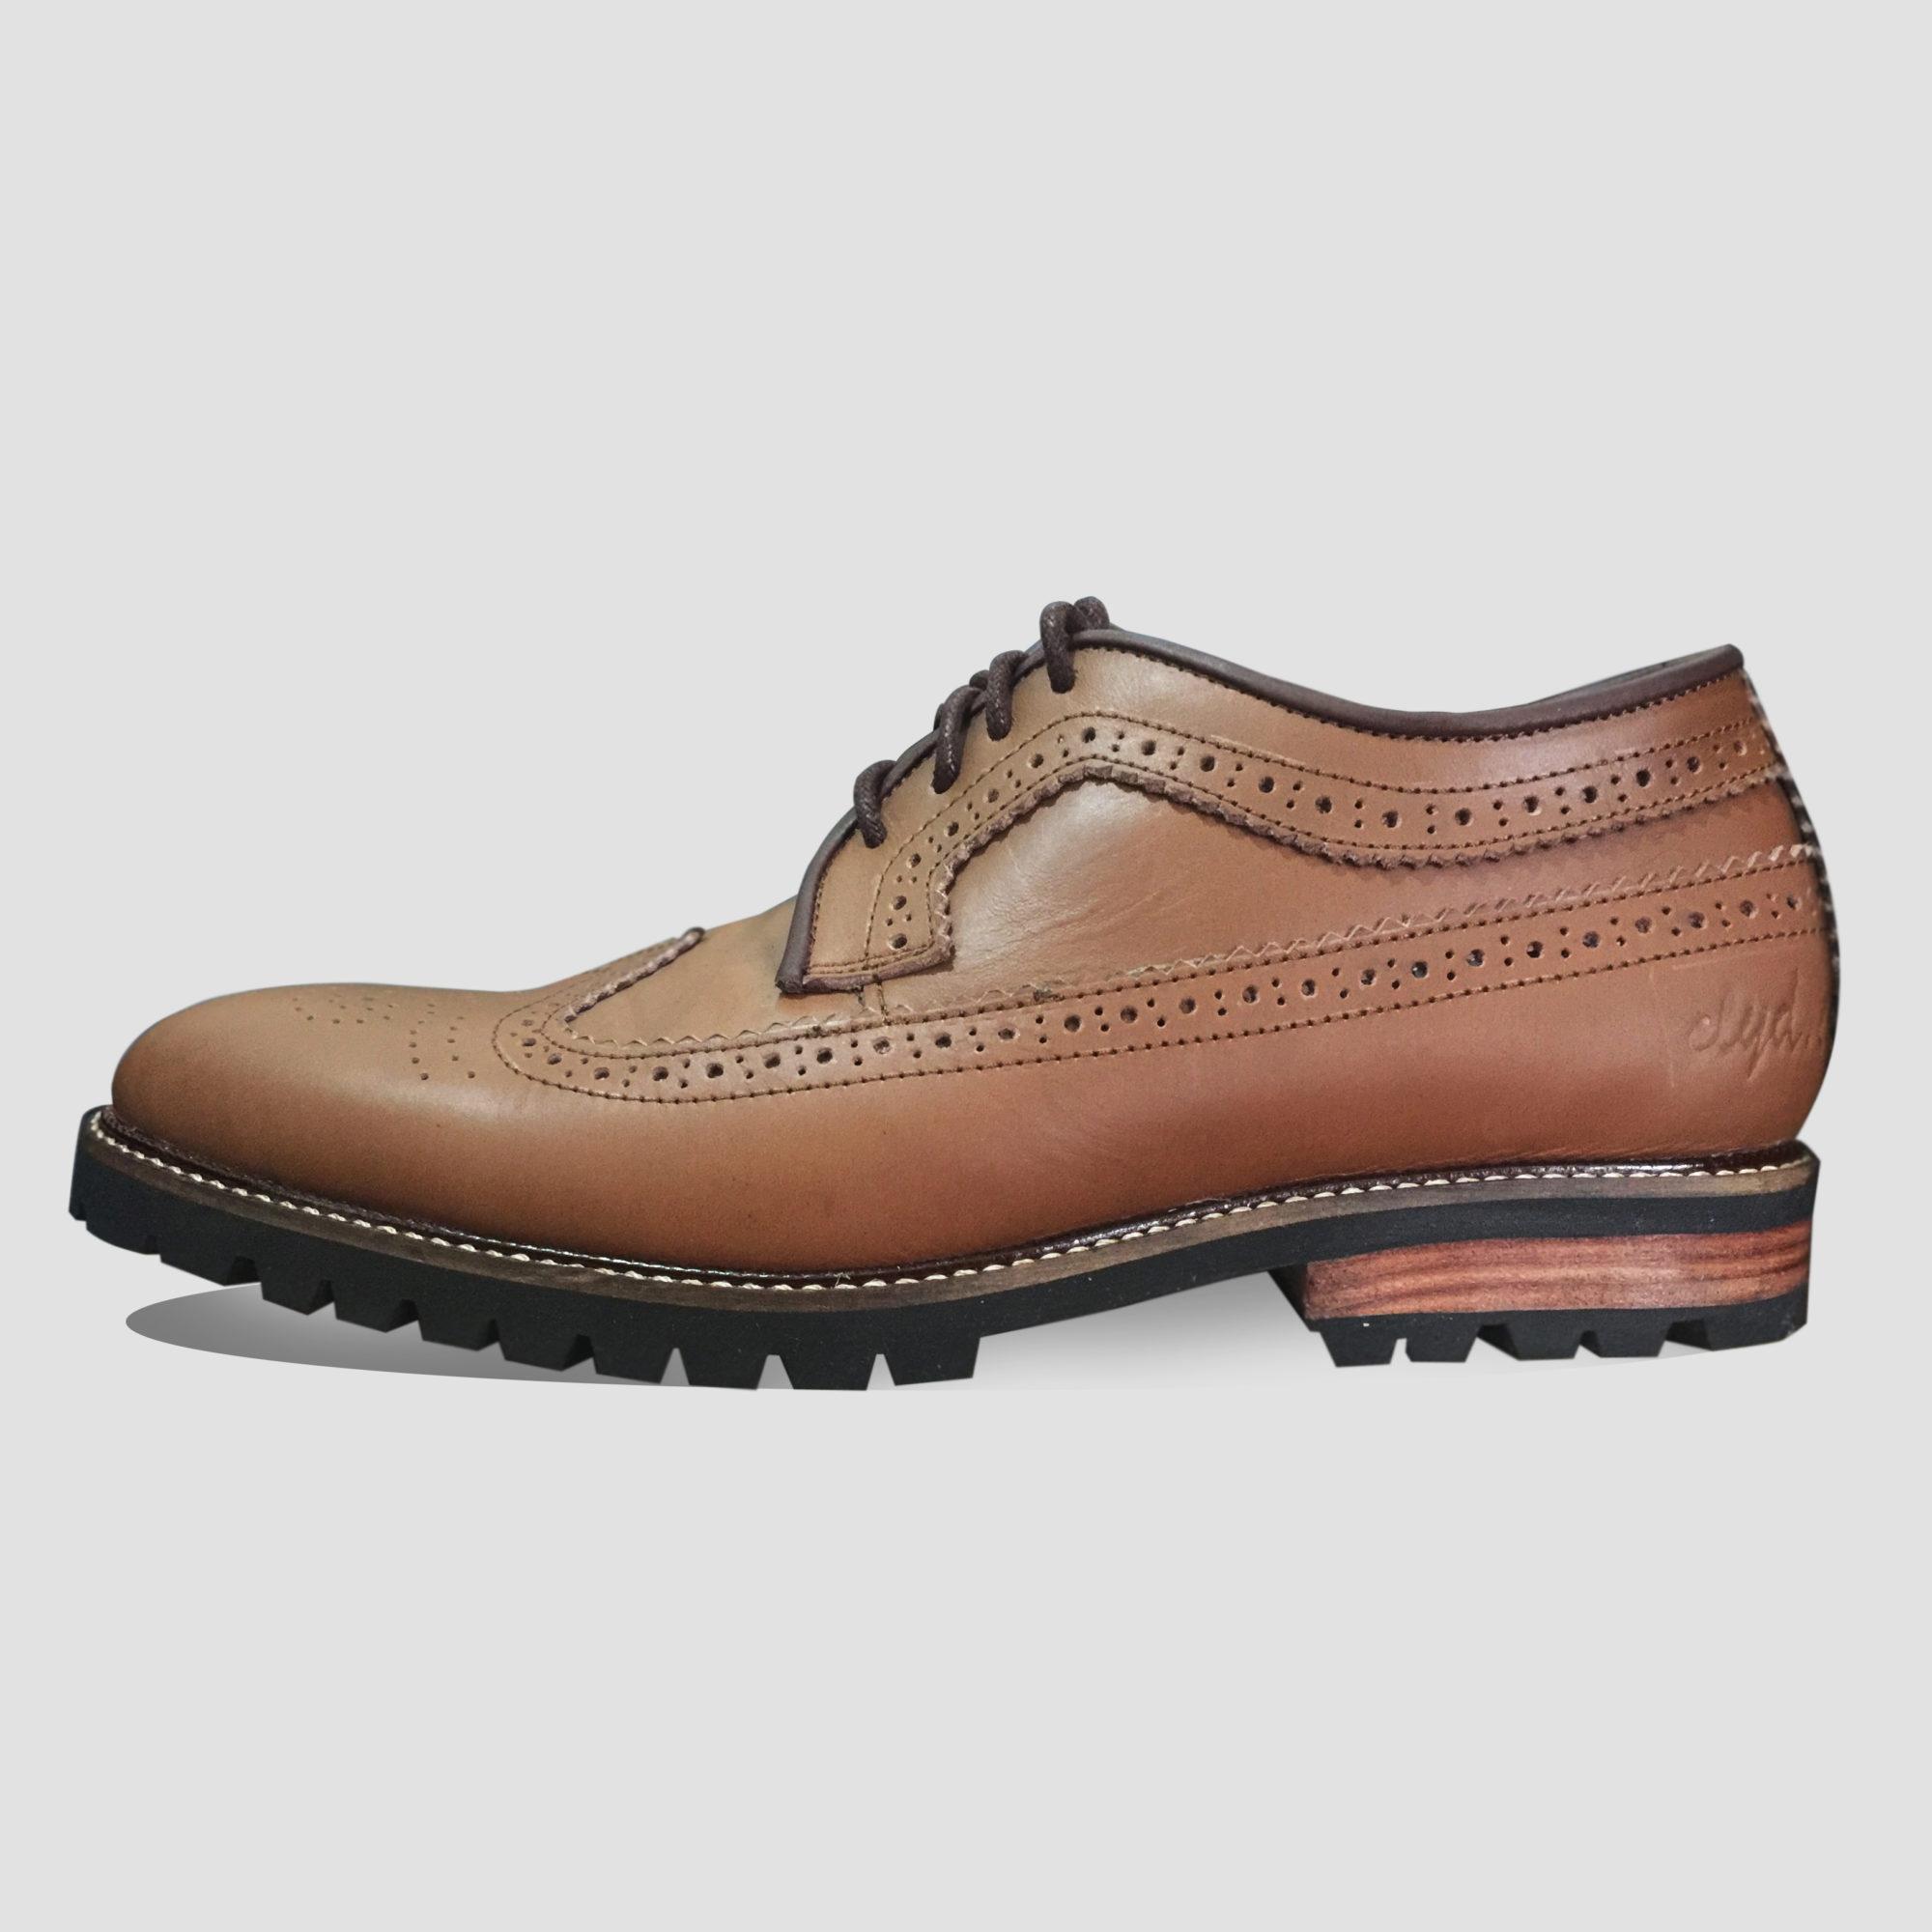 Jual Sepatu Kulit Homemade – Confidence and Comfy